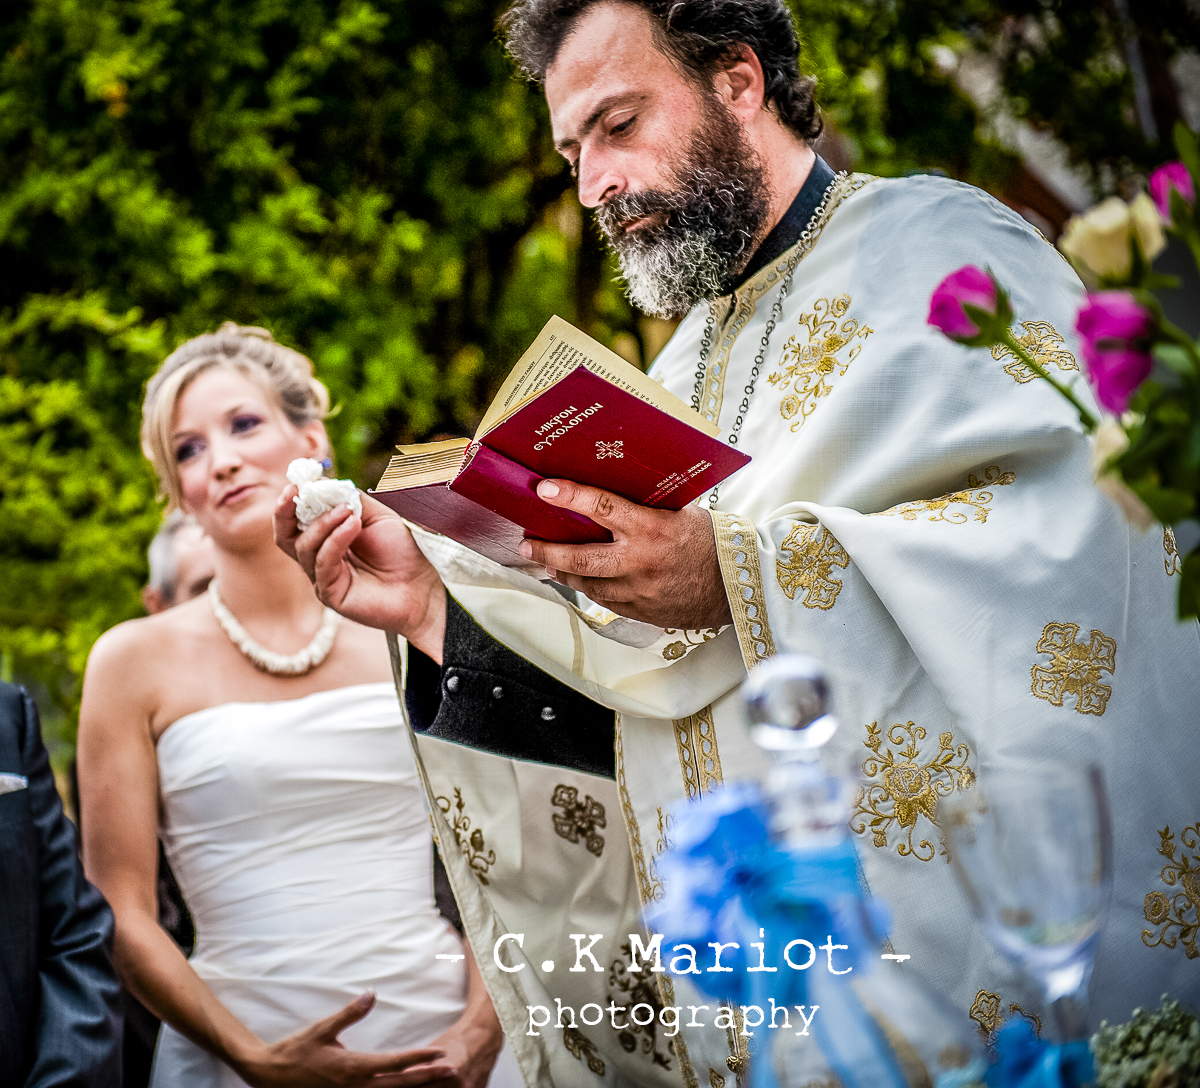 CK-Mariot-Photography-mariage- orthodoxe-crète-0348